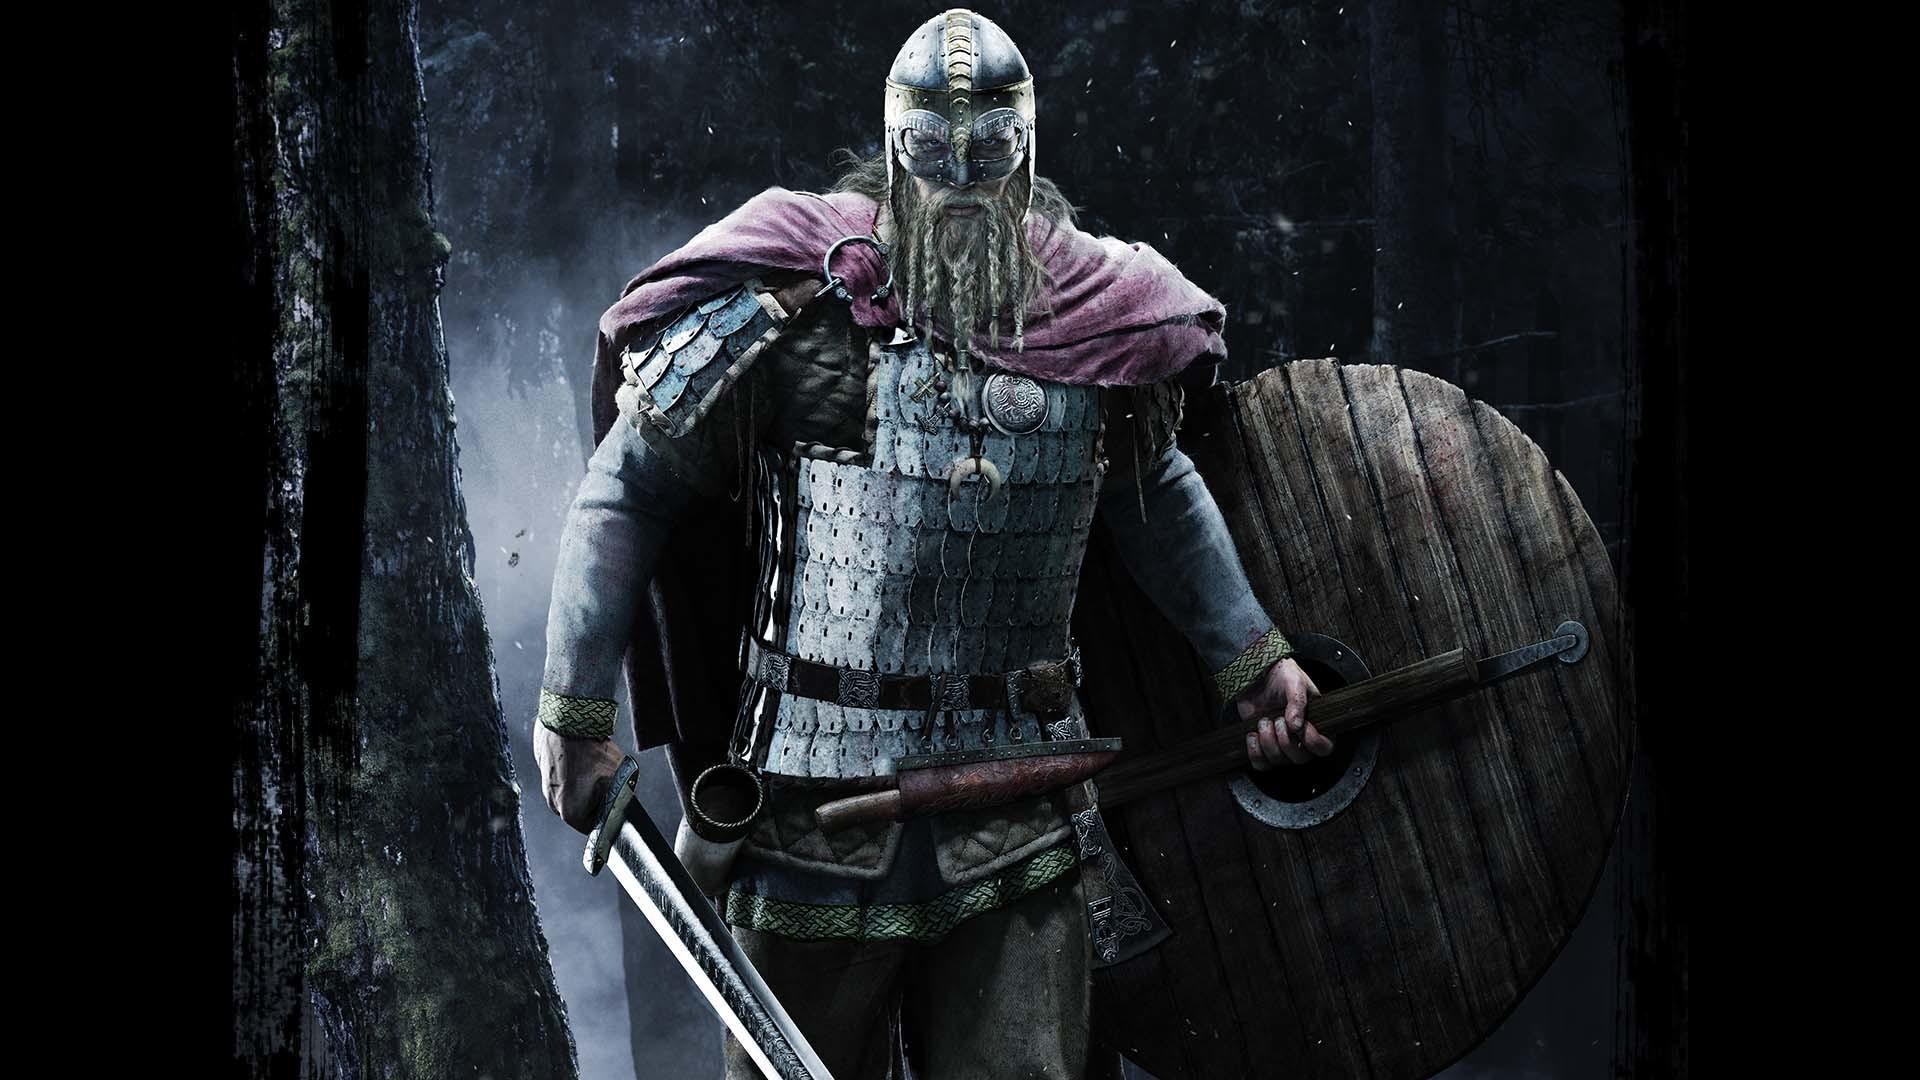 Norse Viking Wallpaper (61+ images)